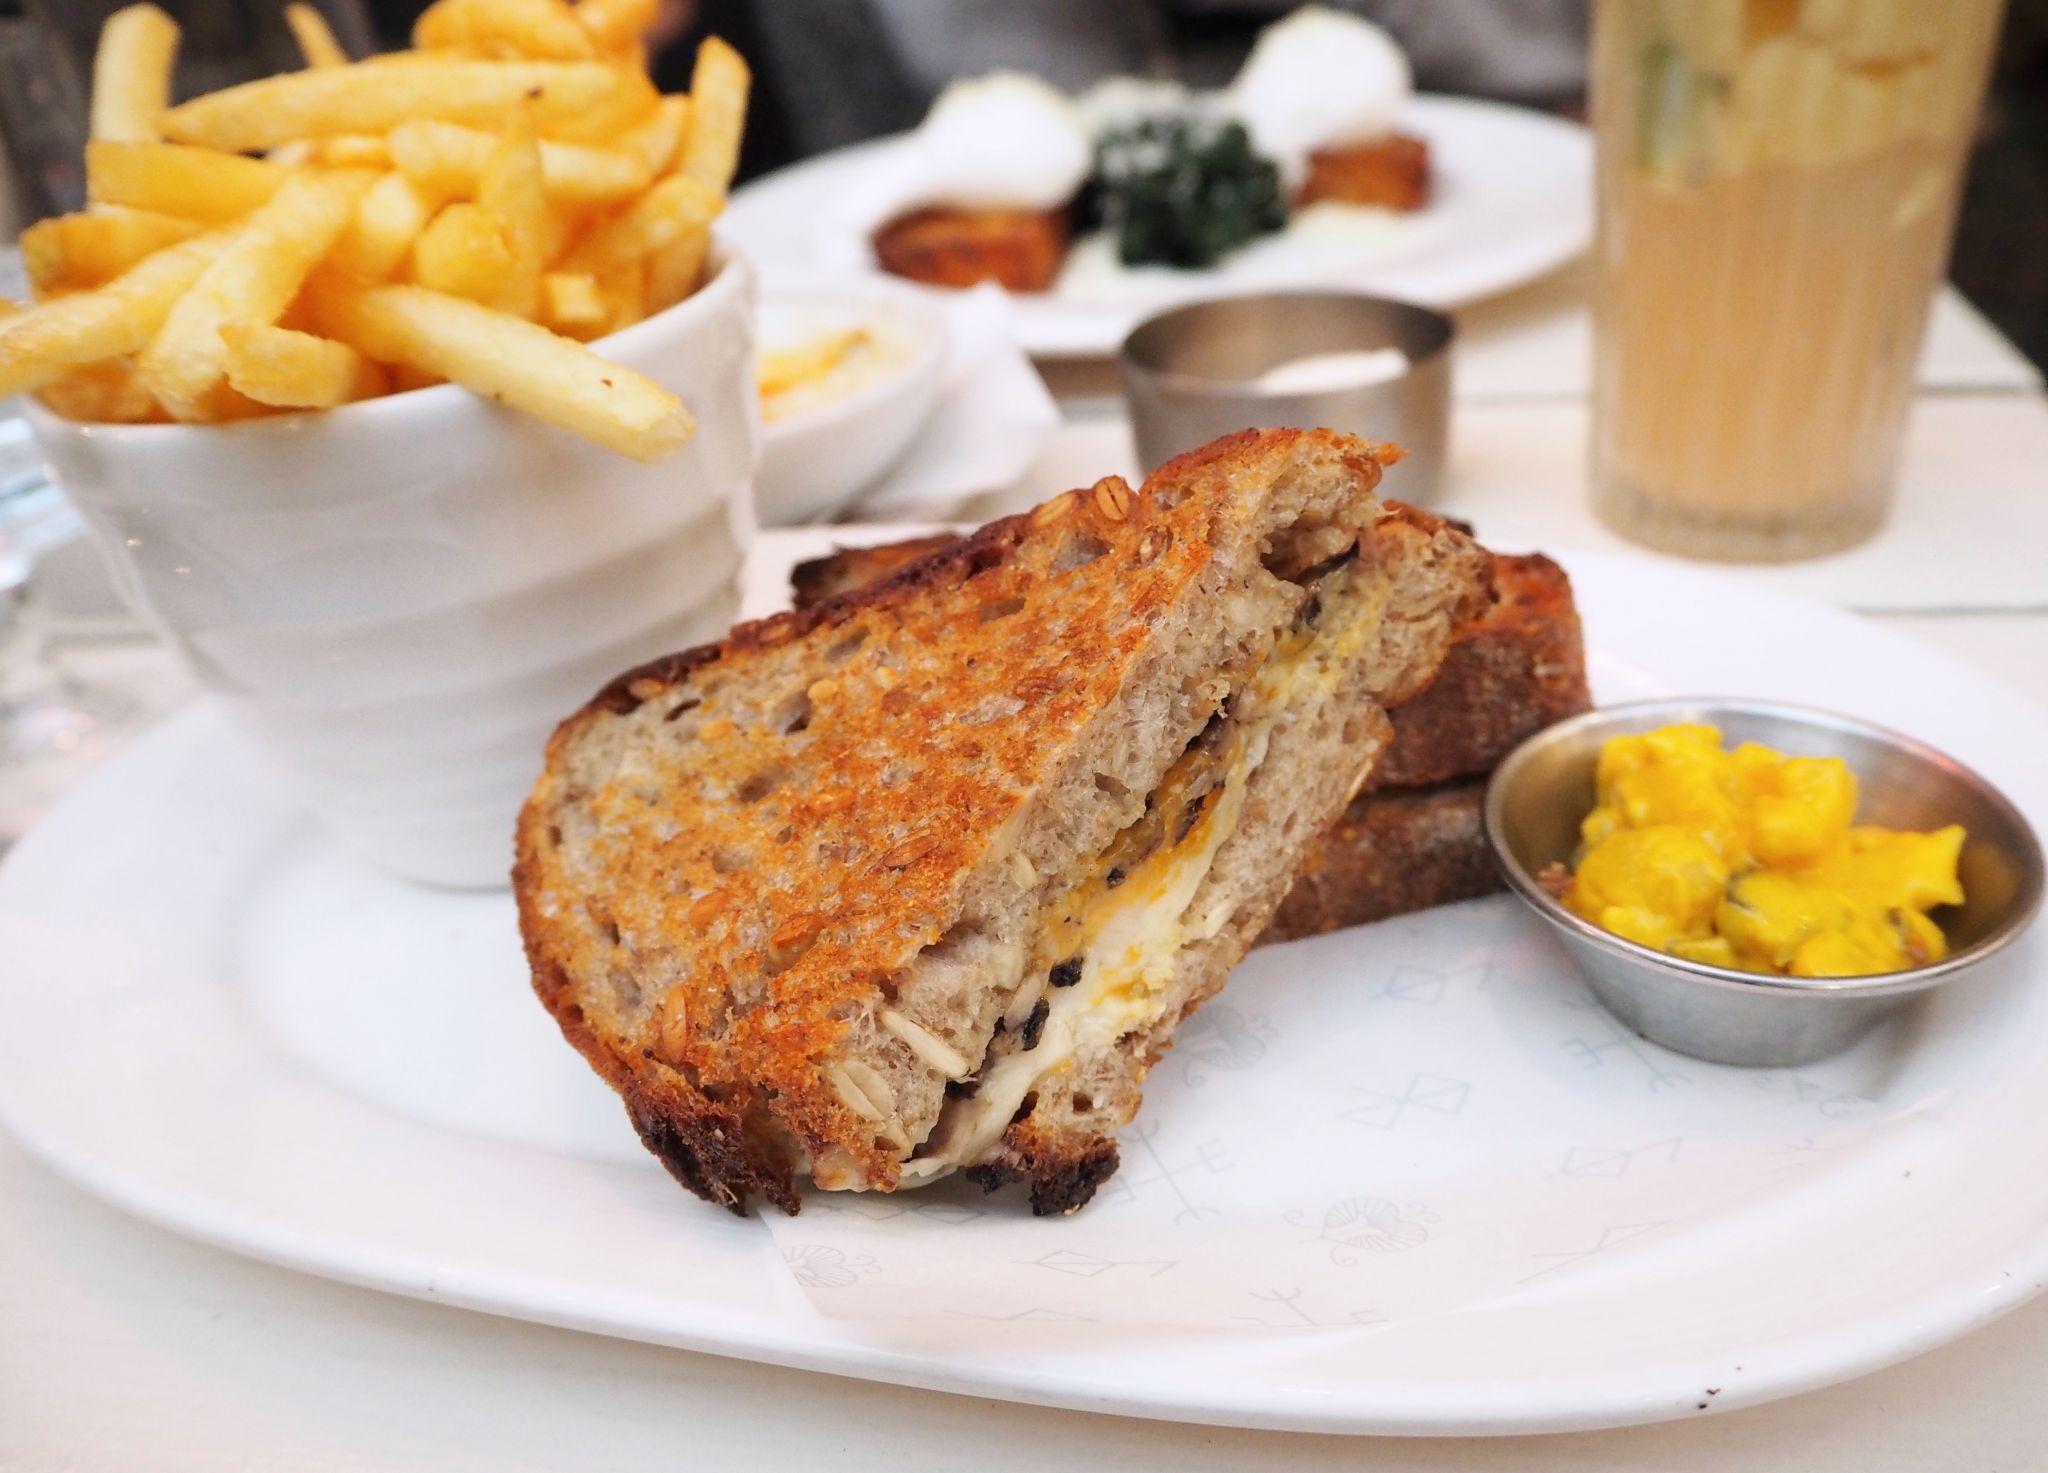 Blixen grilled cheese sandwich